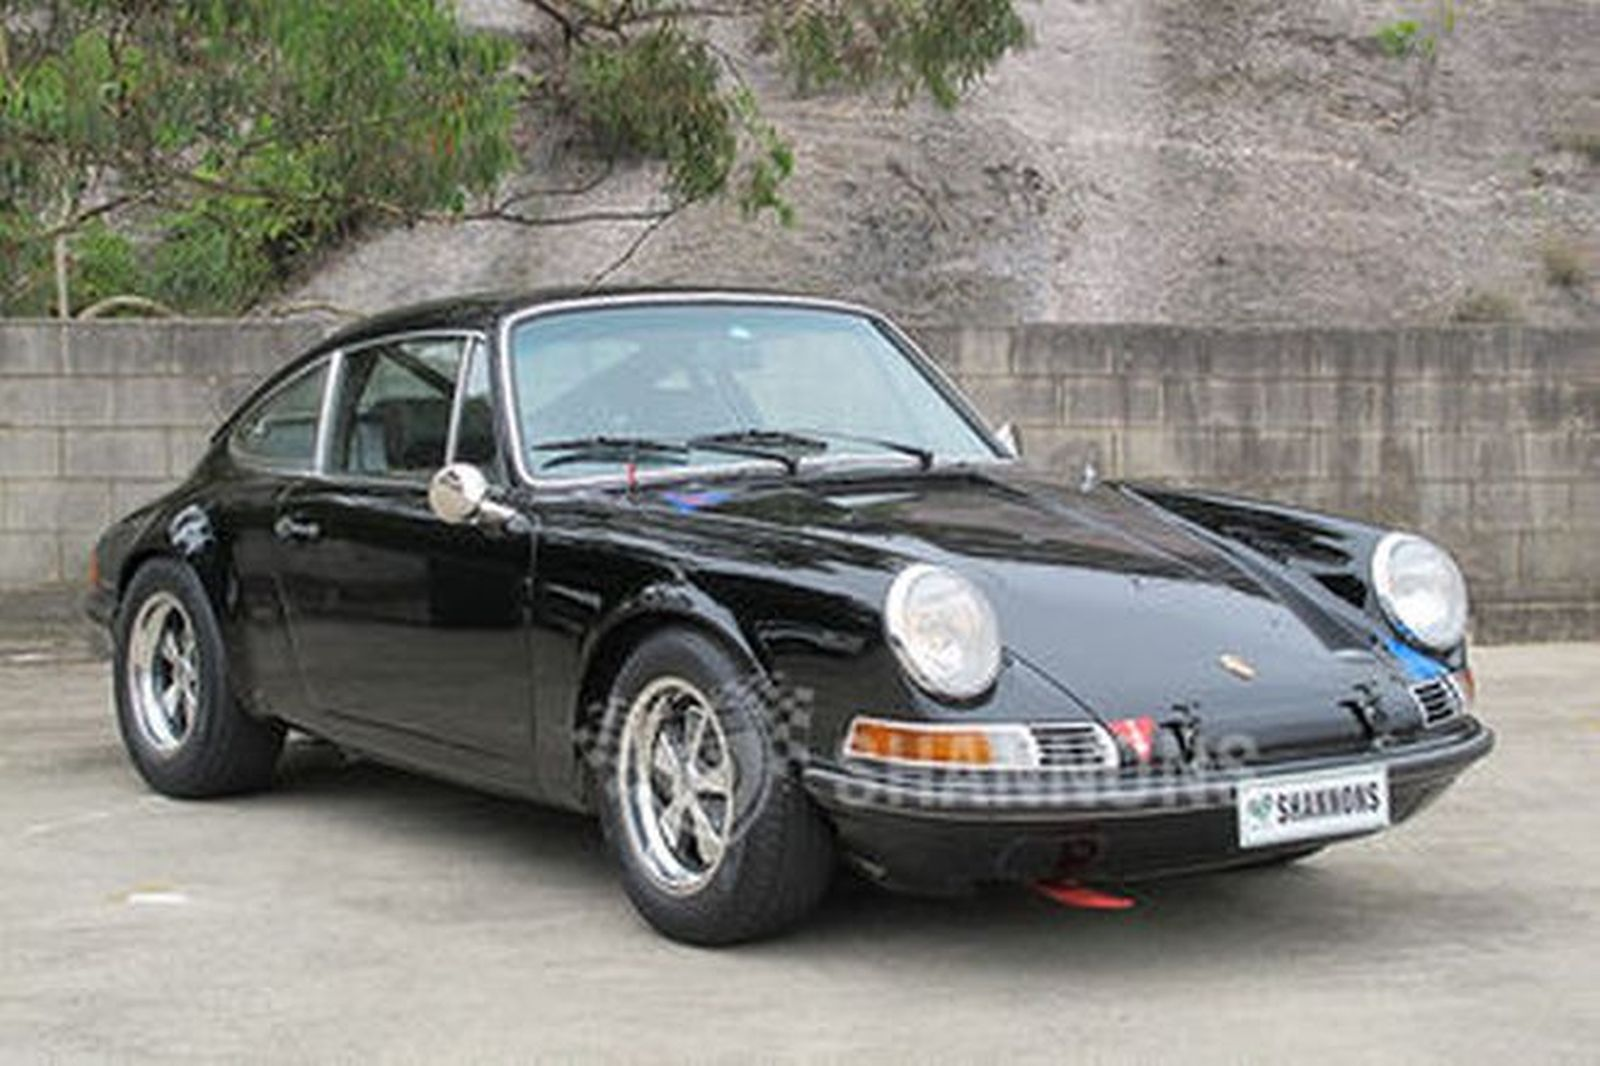 Porsche 911T 2.2 'Tarmac Rally Prepared' Coupe